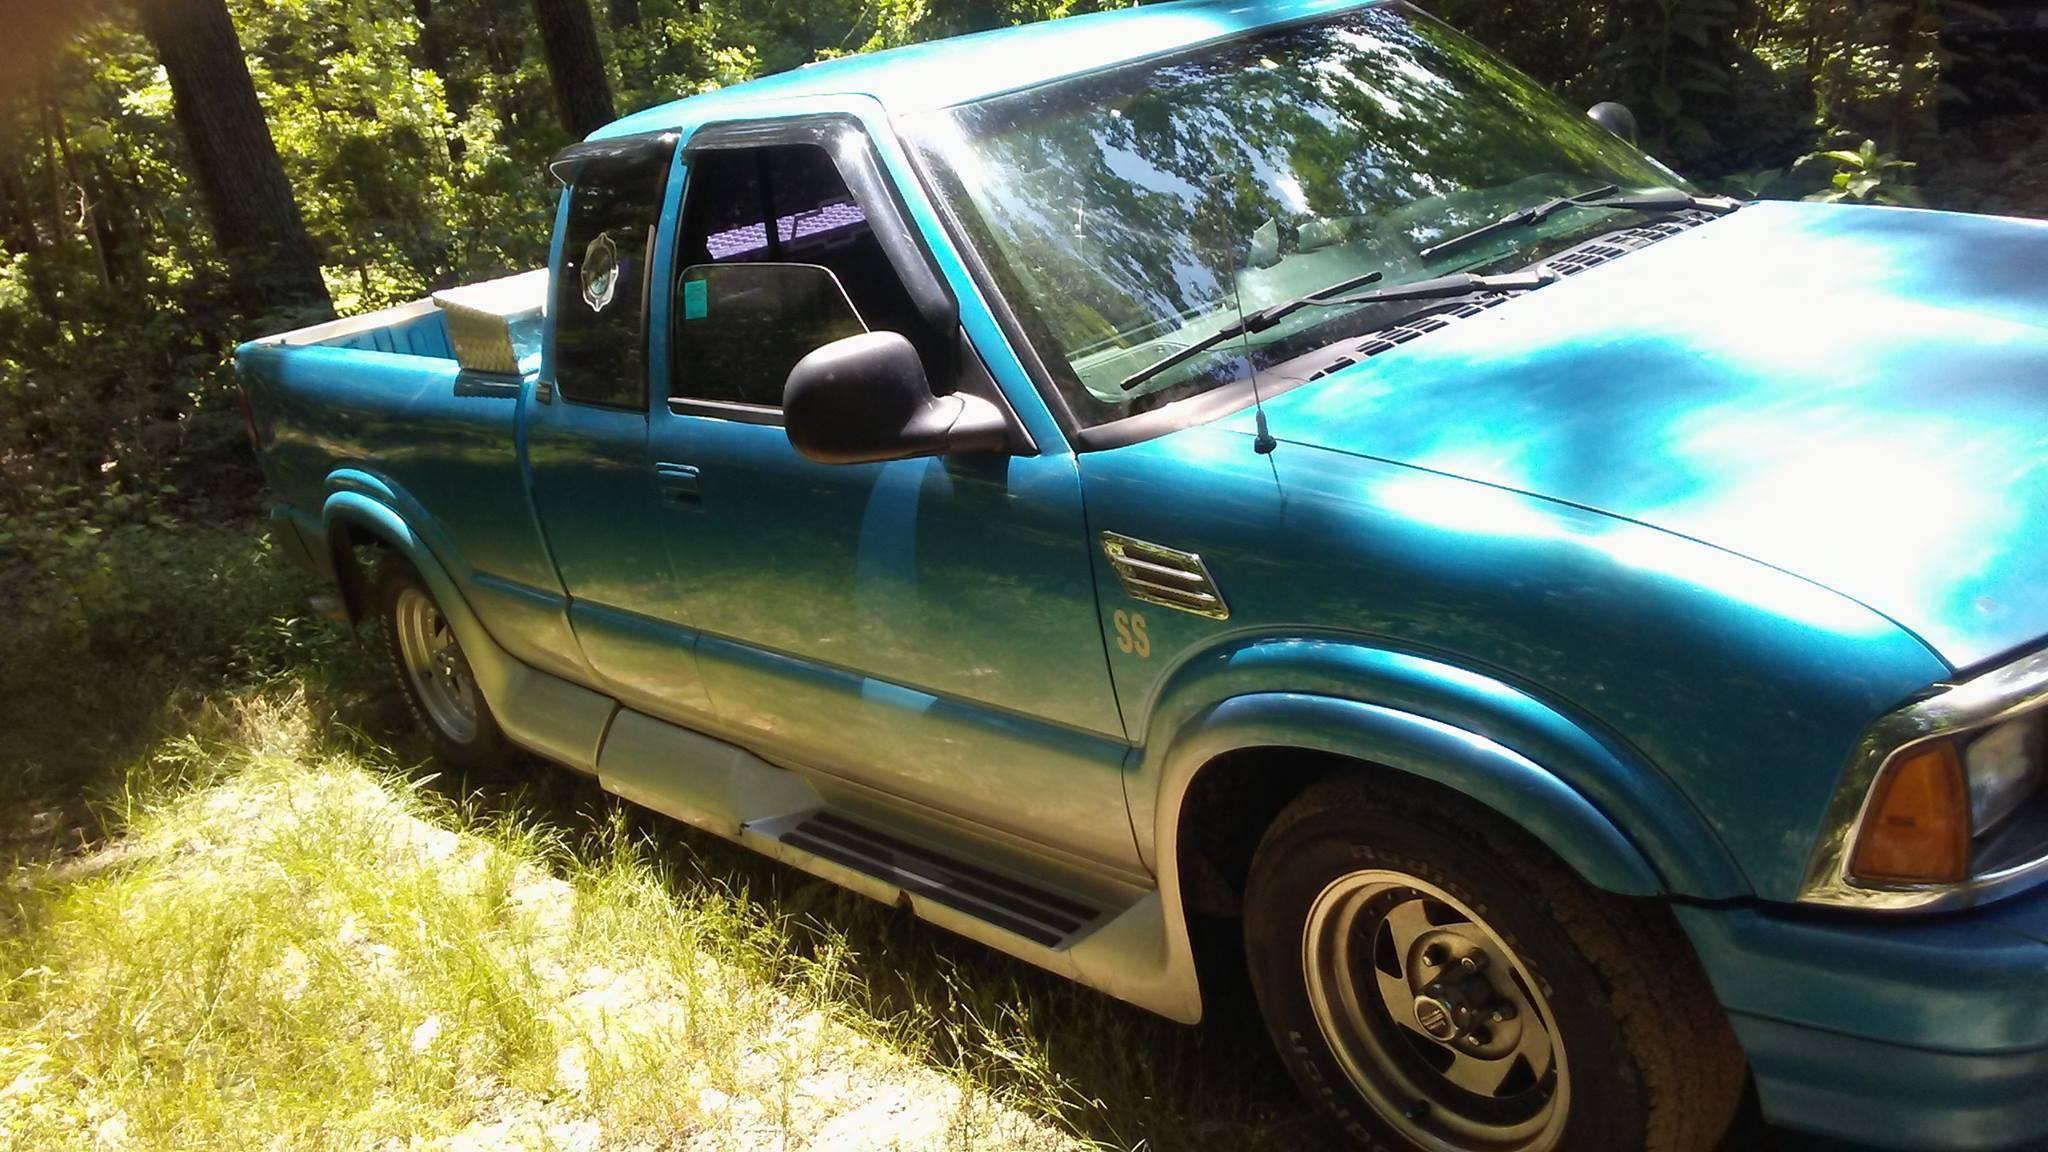 dc165fcbb2168786f463_Monell_Truck.jpg